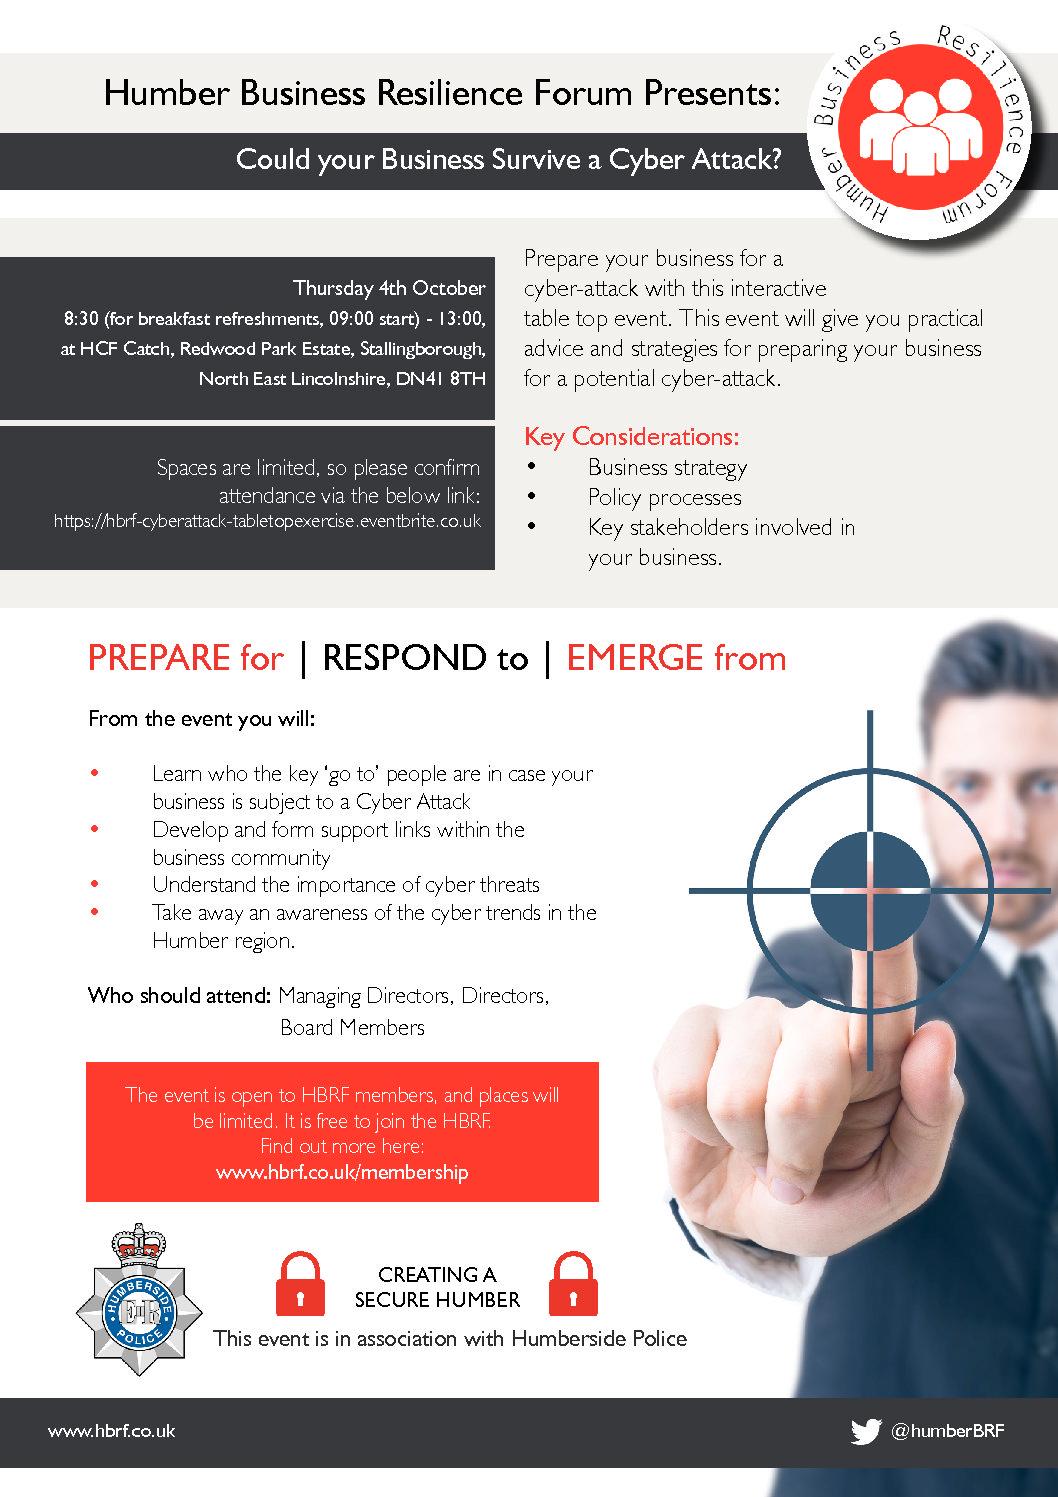 HBRF_Cyber-Attack-Flyer_October-2018-pdf.jpg